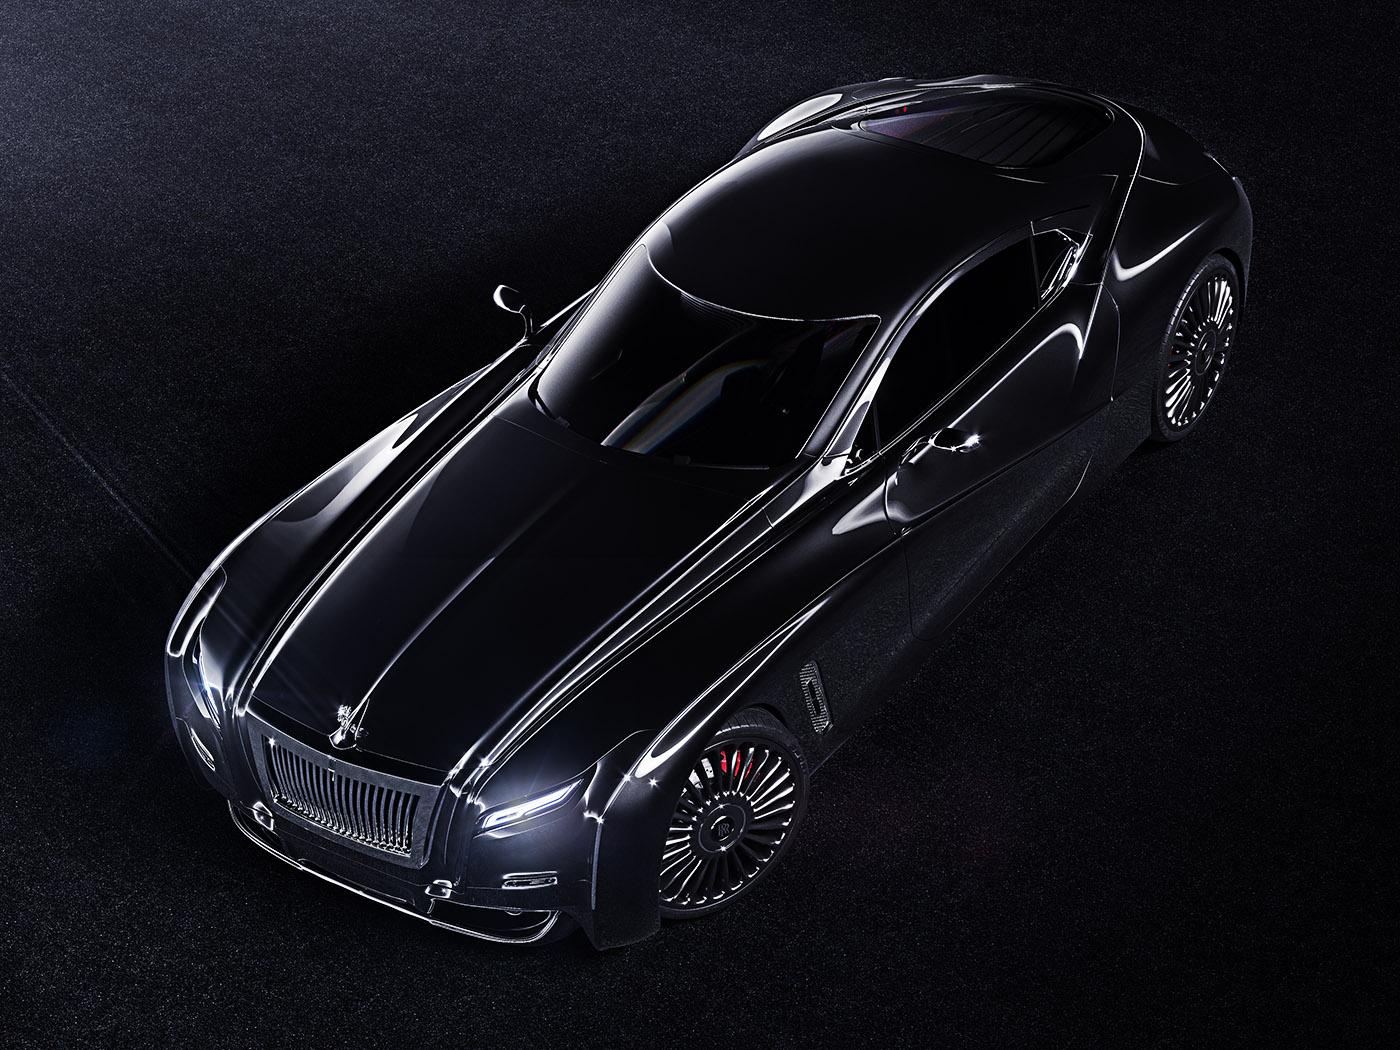 Rolls Royce luxury automotive design 8.jpg